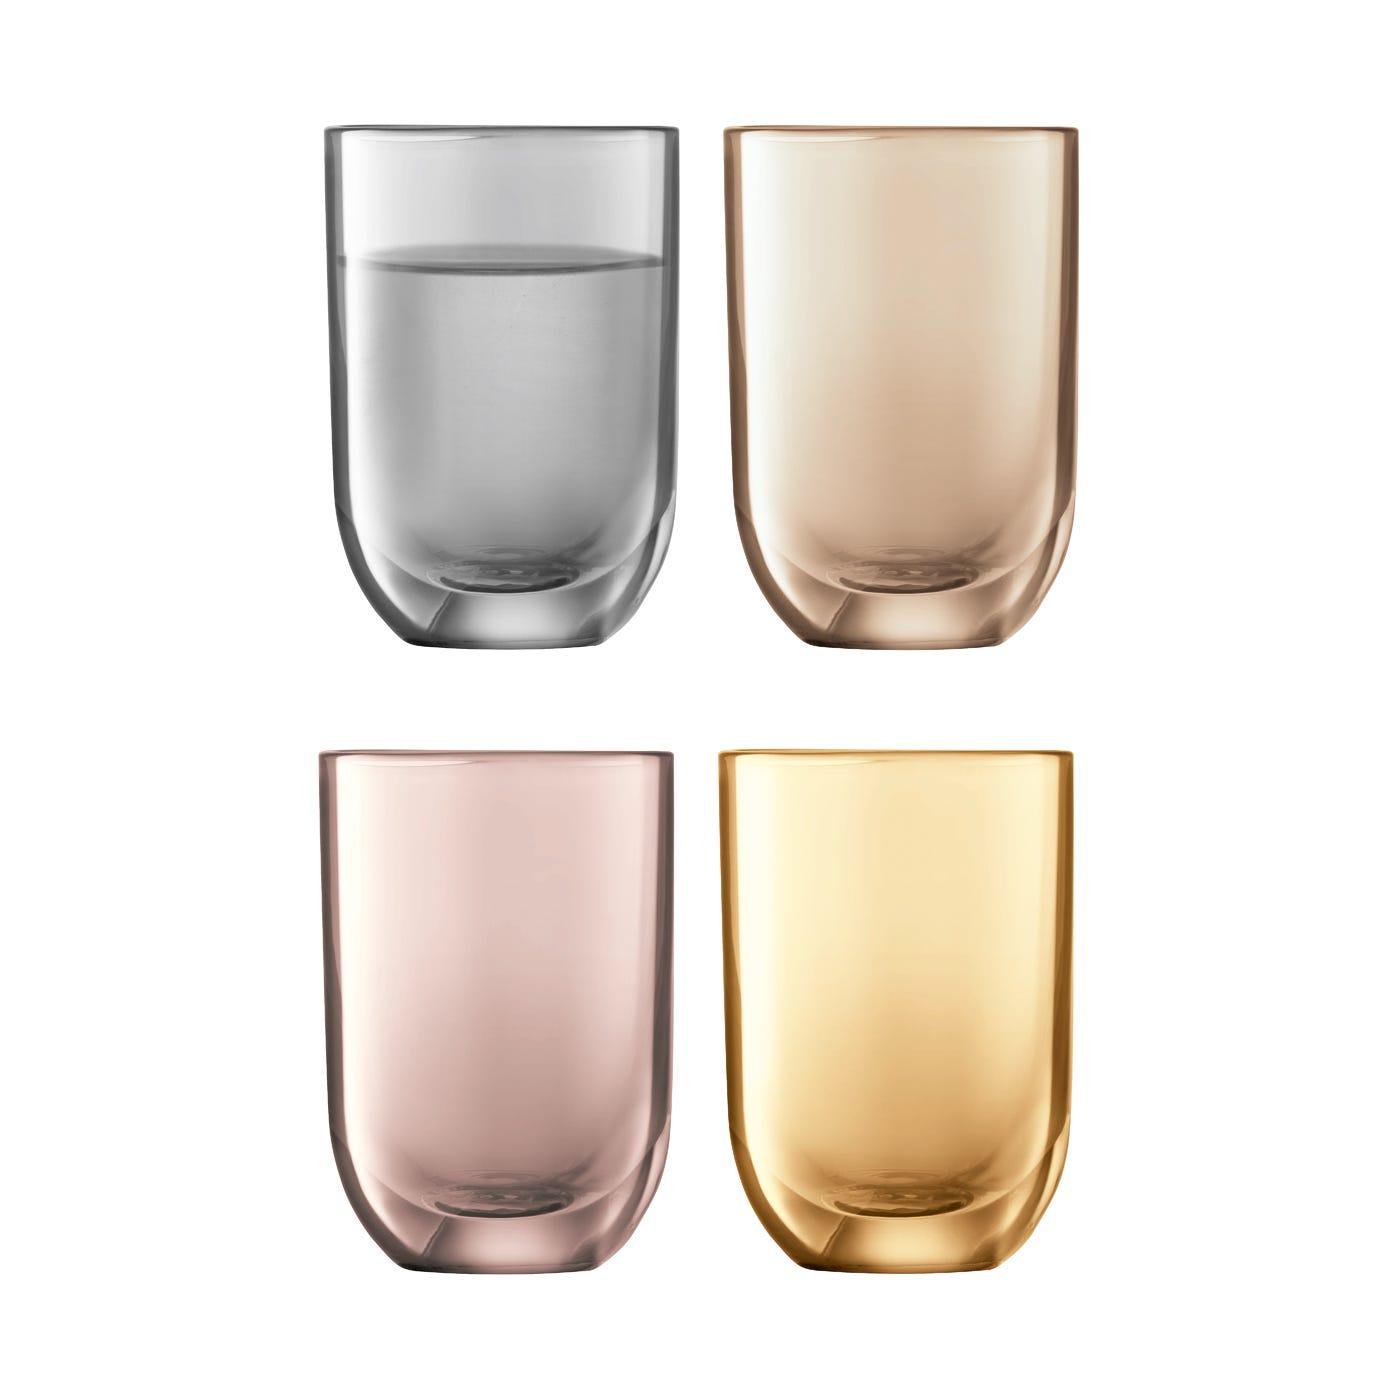 glassware  barware  contemporary  luxury  heal's - polka shot glasses metallics assorted set of